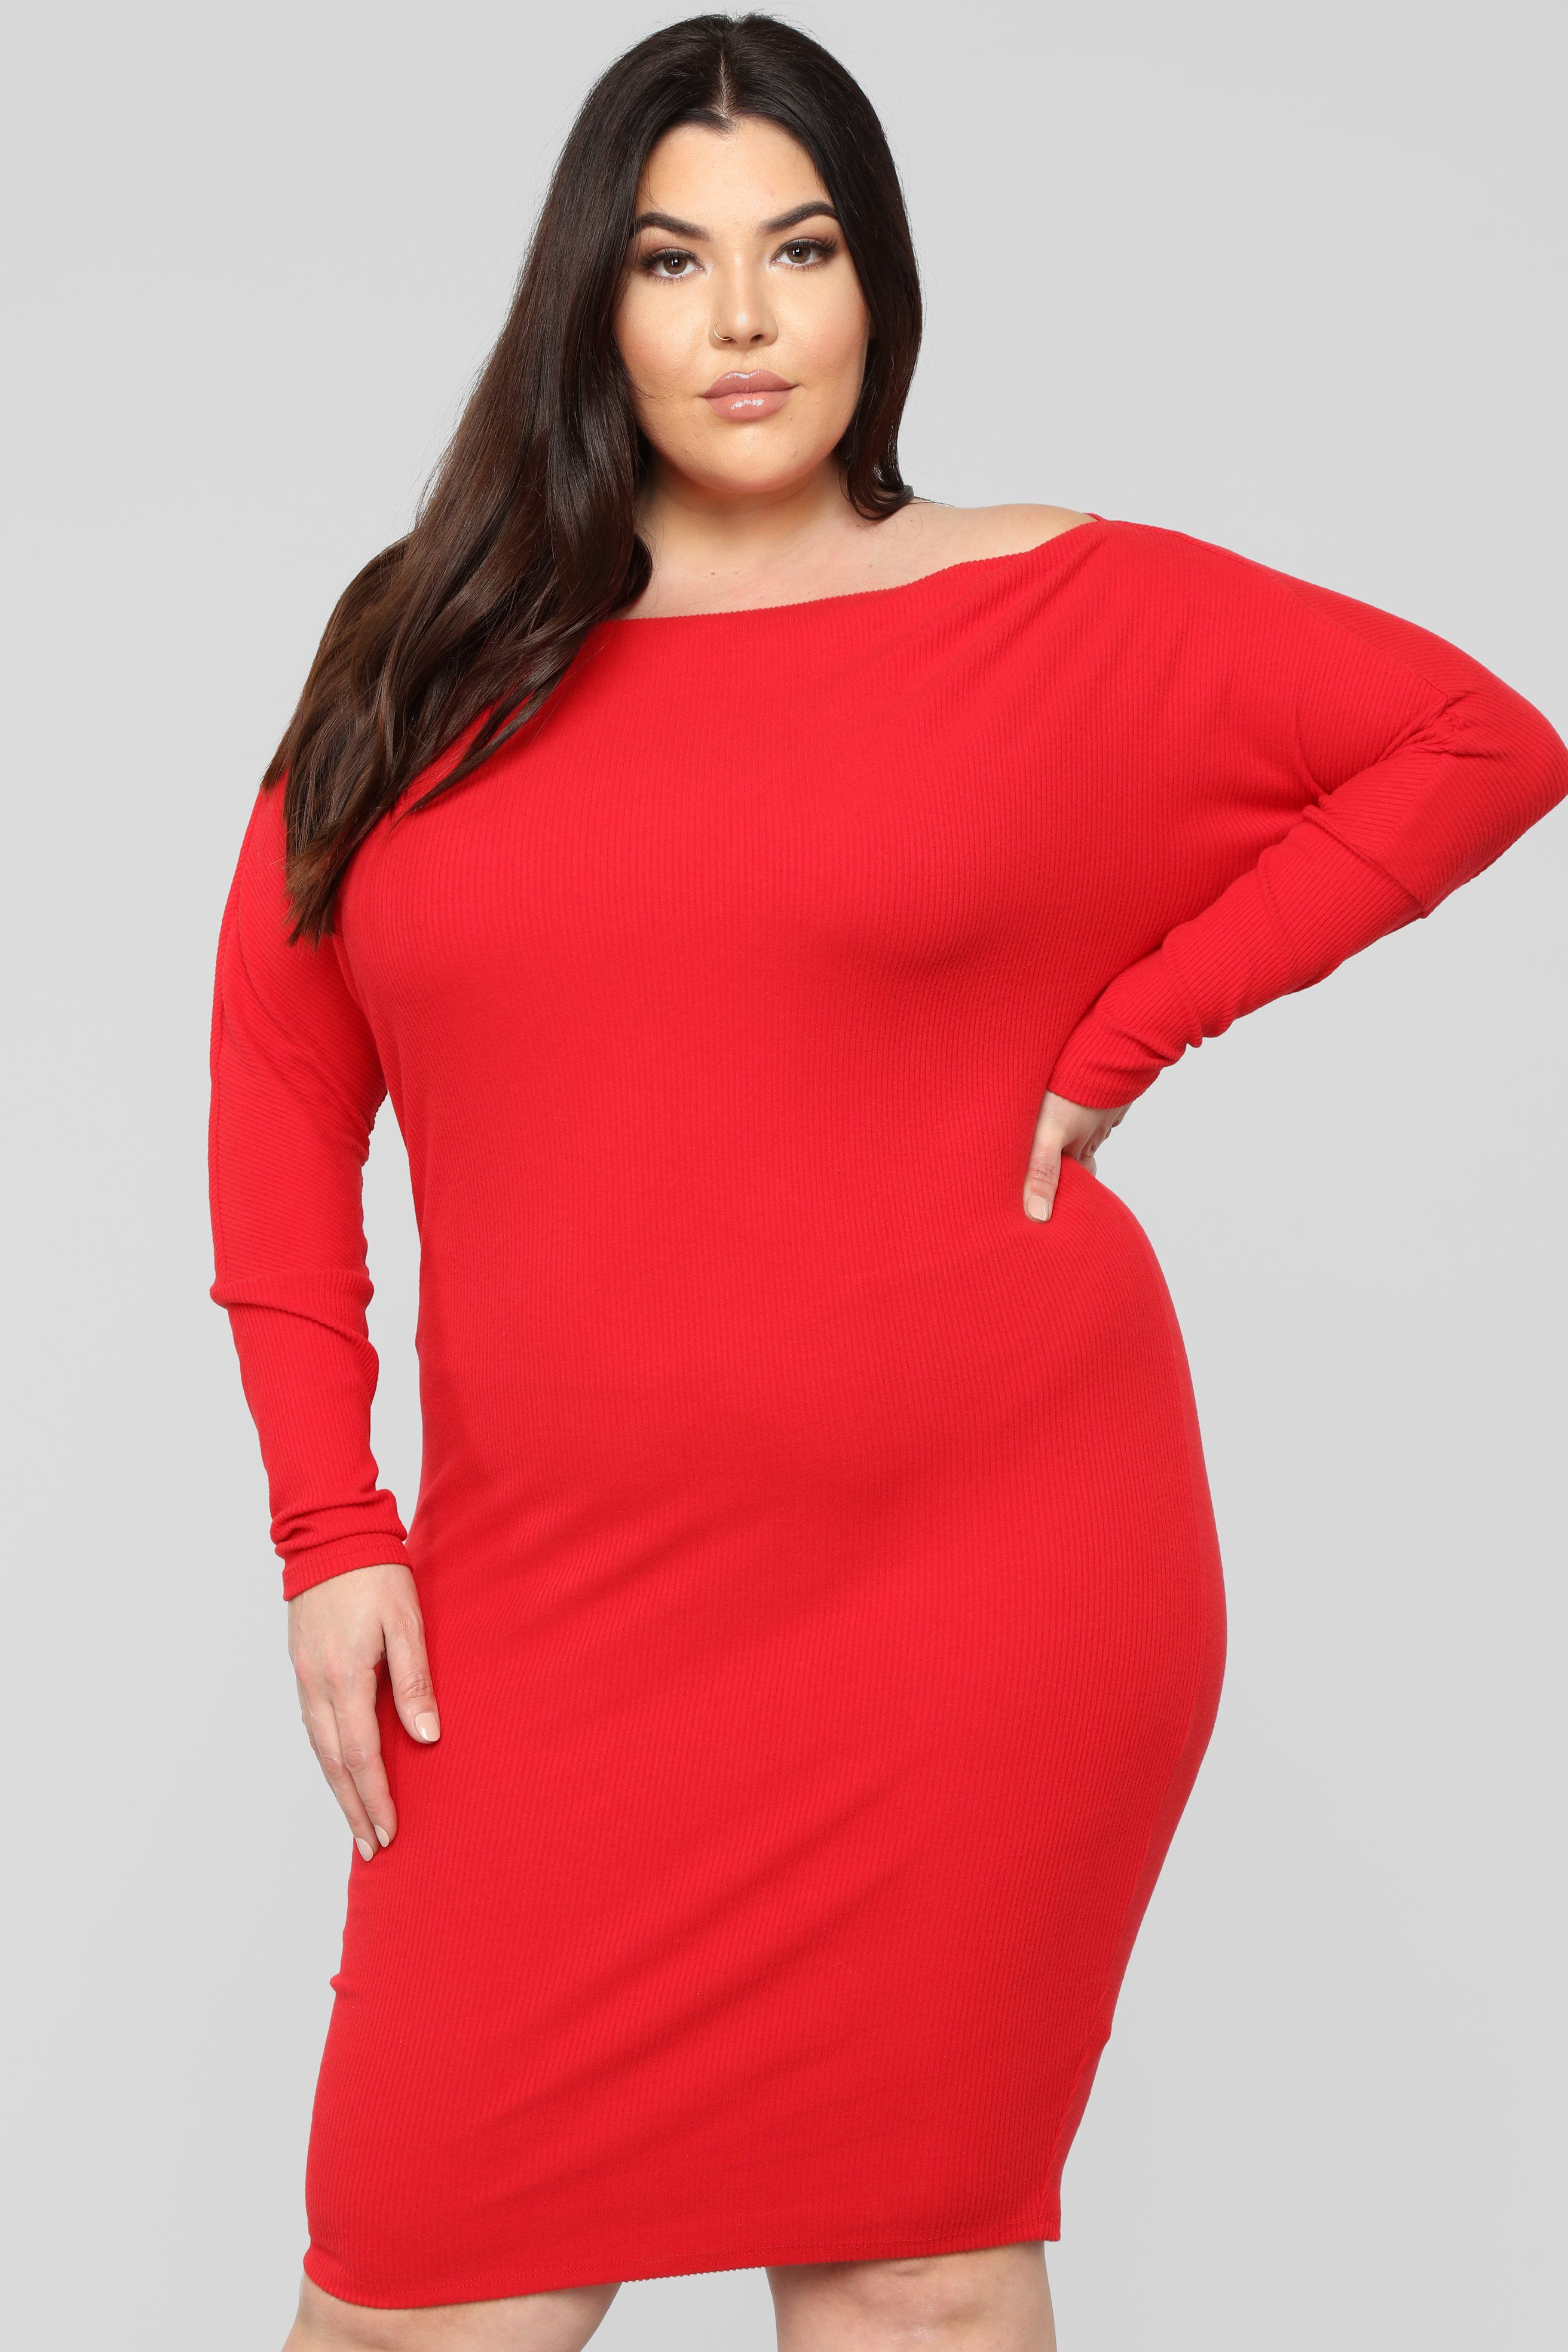 Sara Midi Dress Red In 2021 Red Dress Fashion Red Cocktail Dress [ 3936 x 2624 Pixel ]